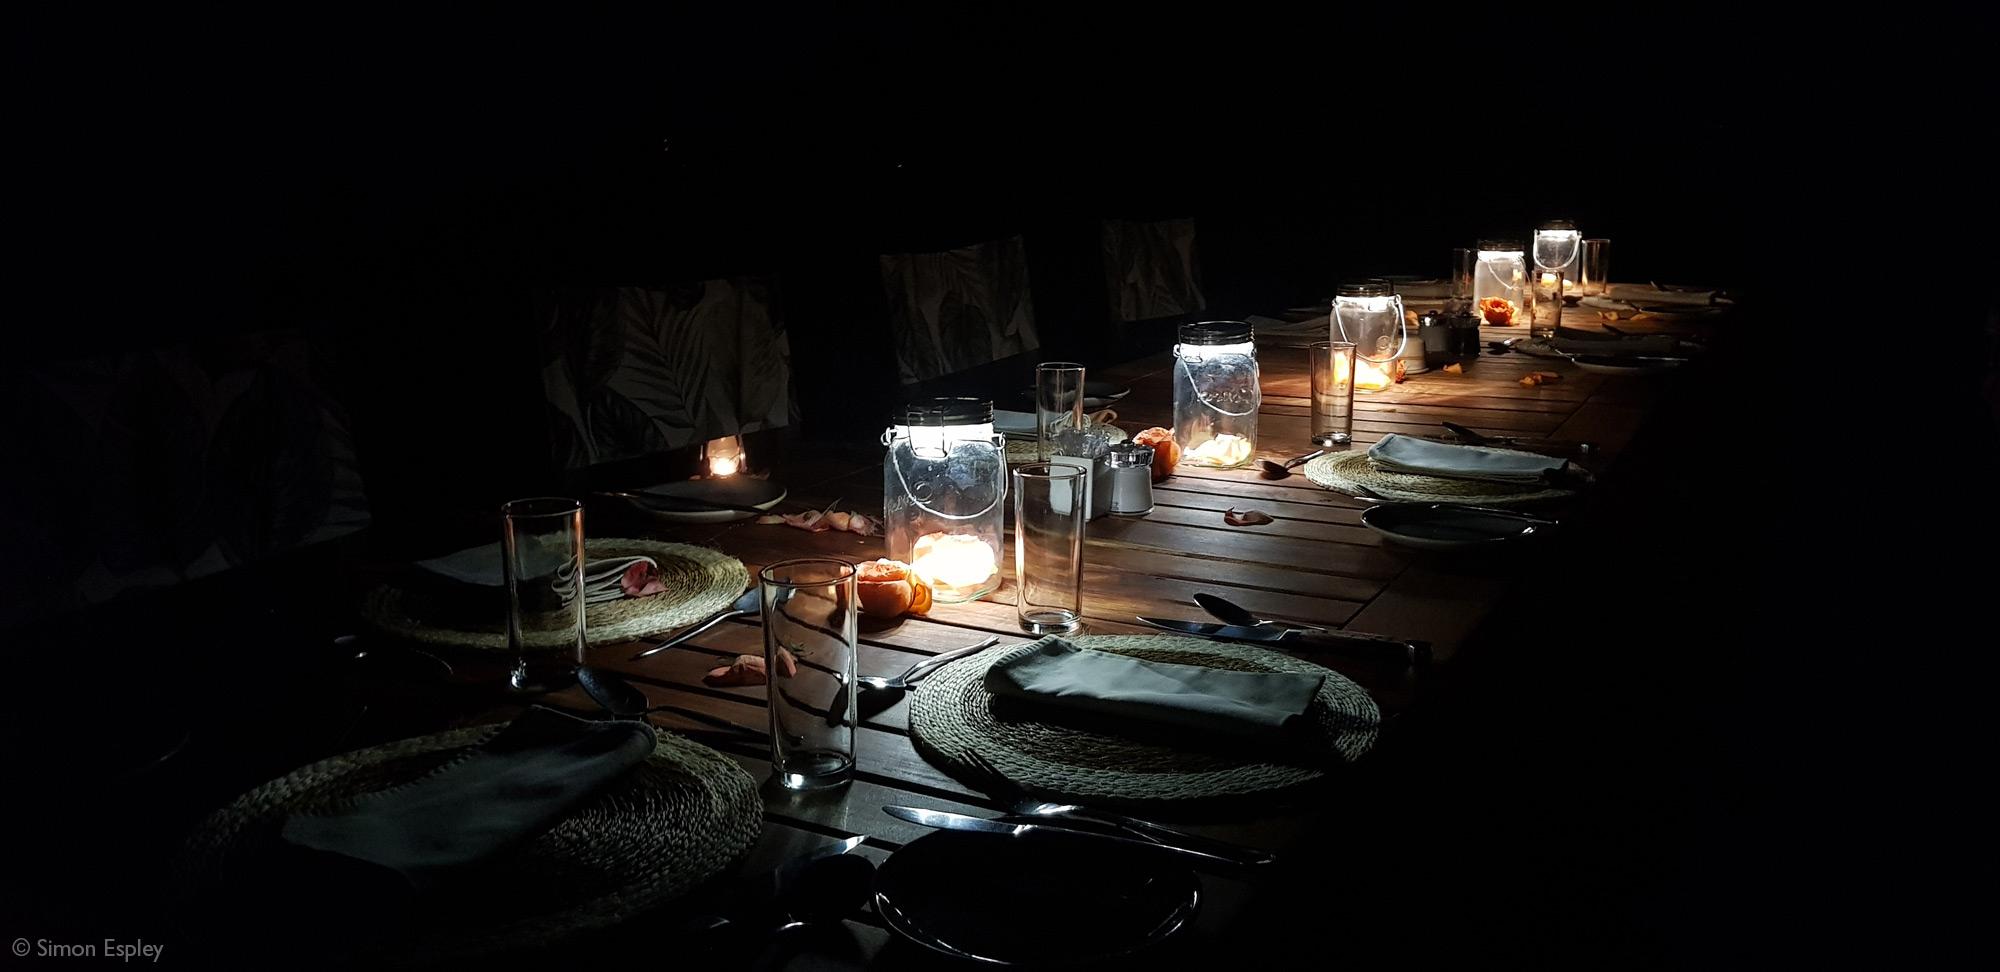 Bush dinner at night time